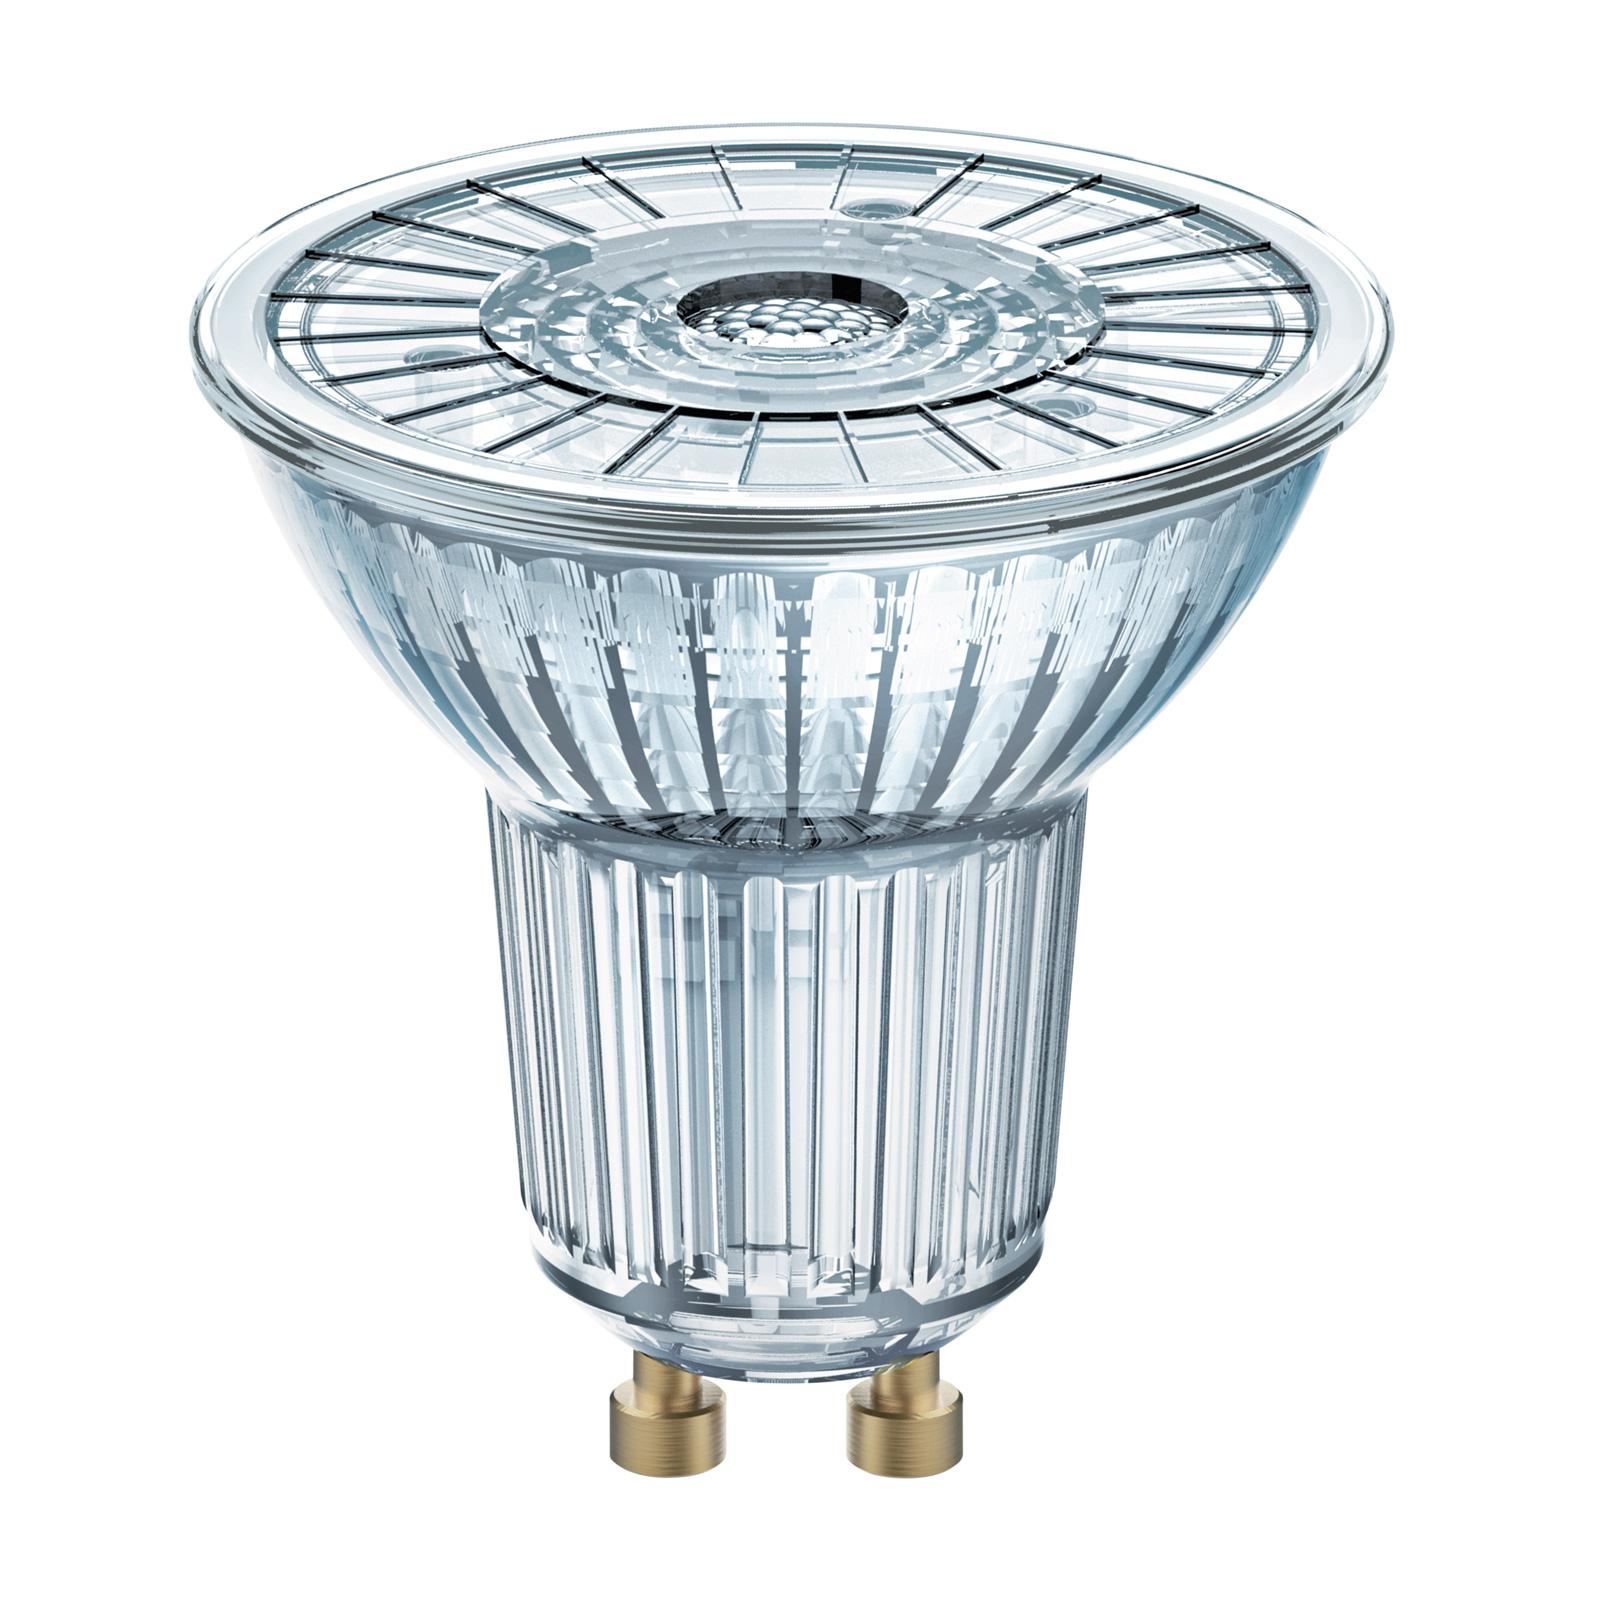 11048-OSRAM-LED-PARATHOM-PAR16-GU10-3W-wie-35-Watt-3000K-230lm-36-warmweiss-dimmbar-1 Verwunderlich Gu10 Led Dimmbar Dekorationen